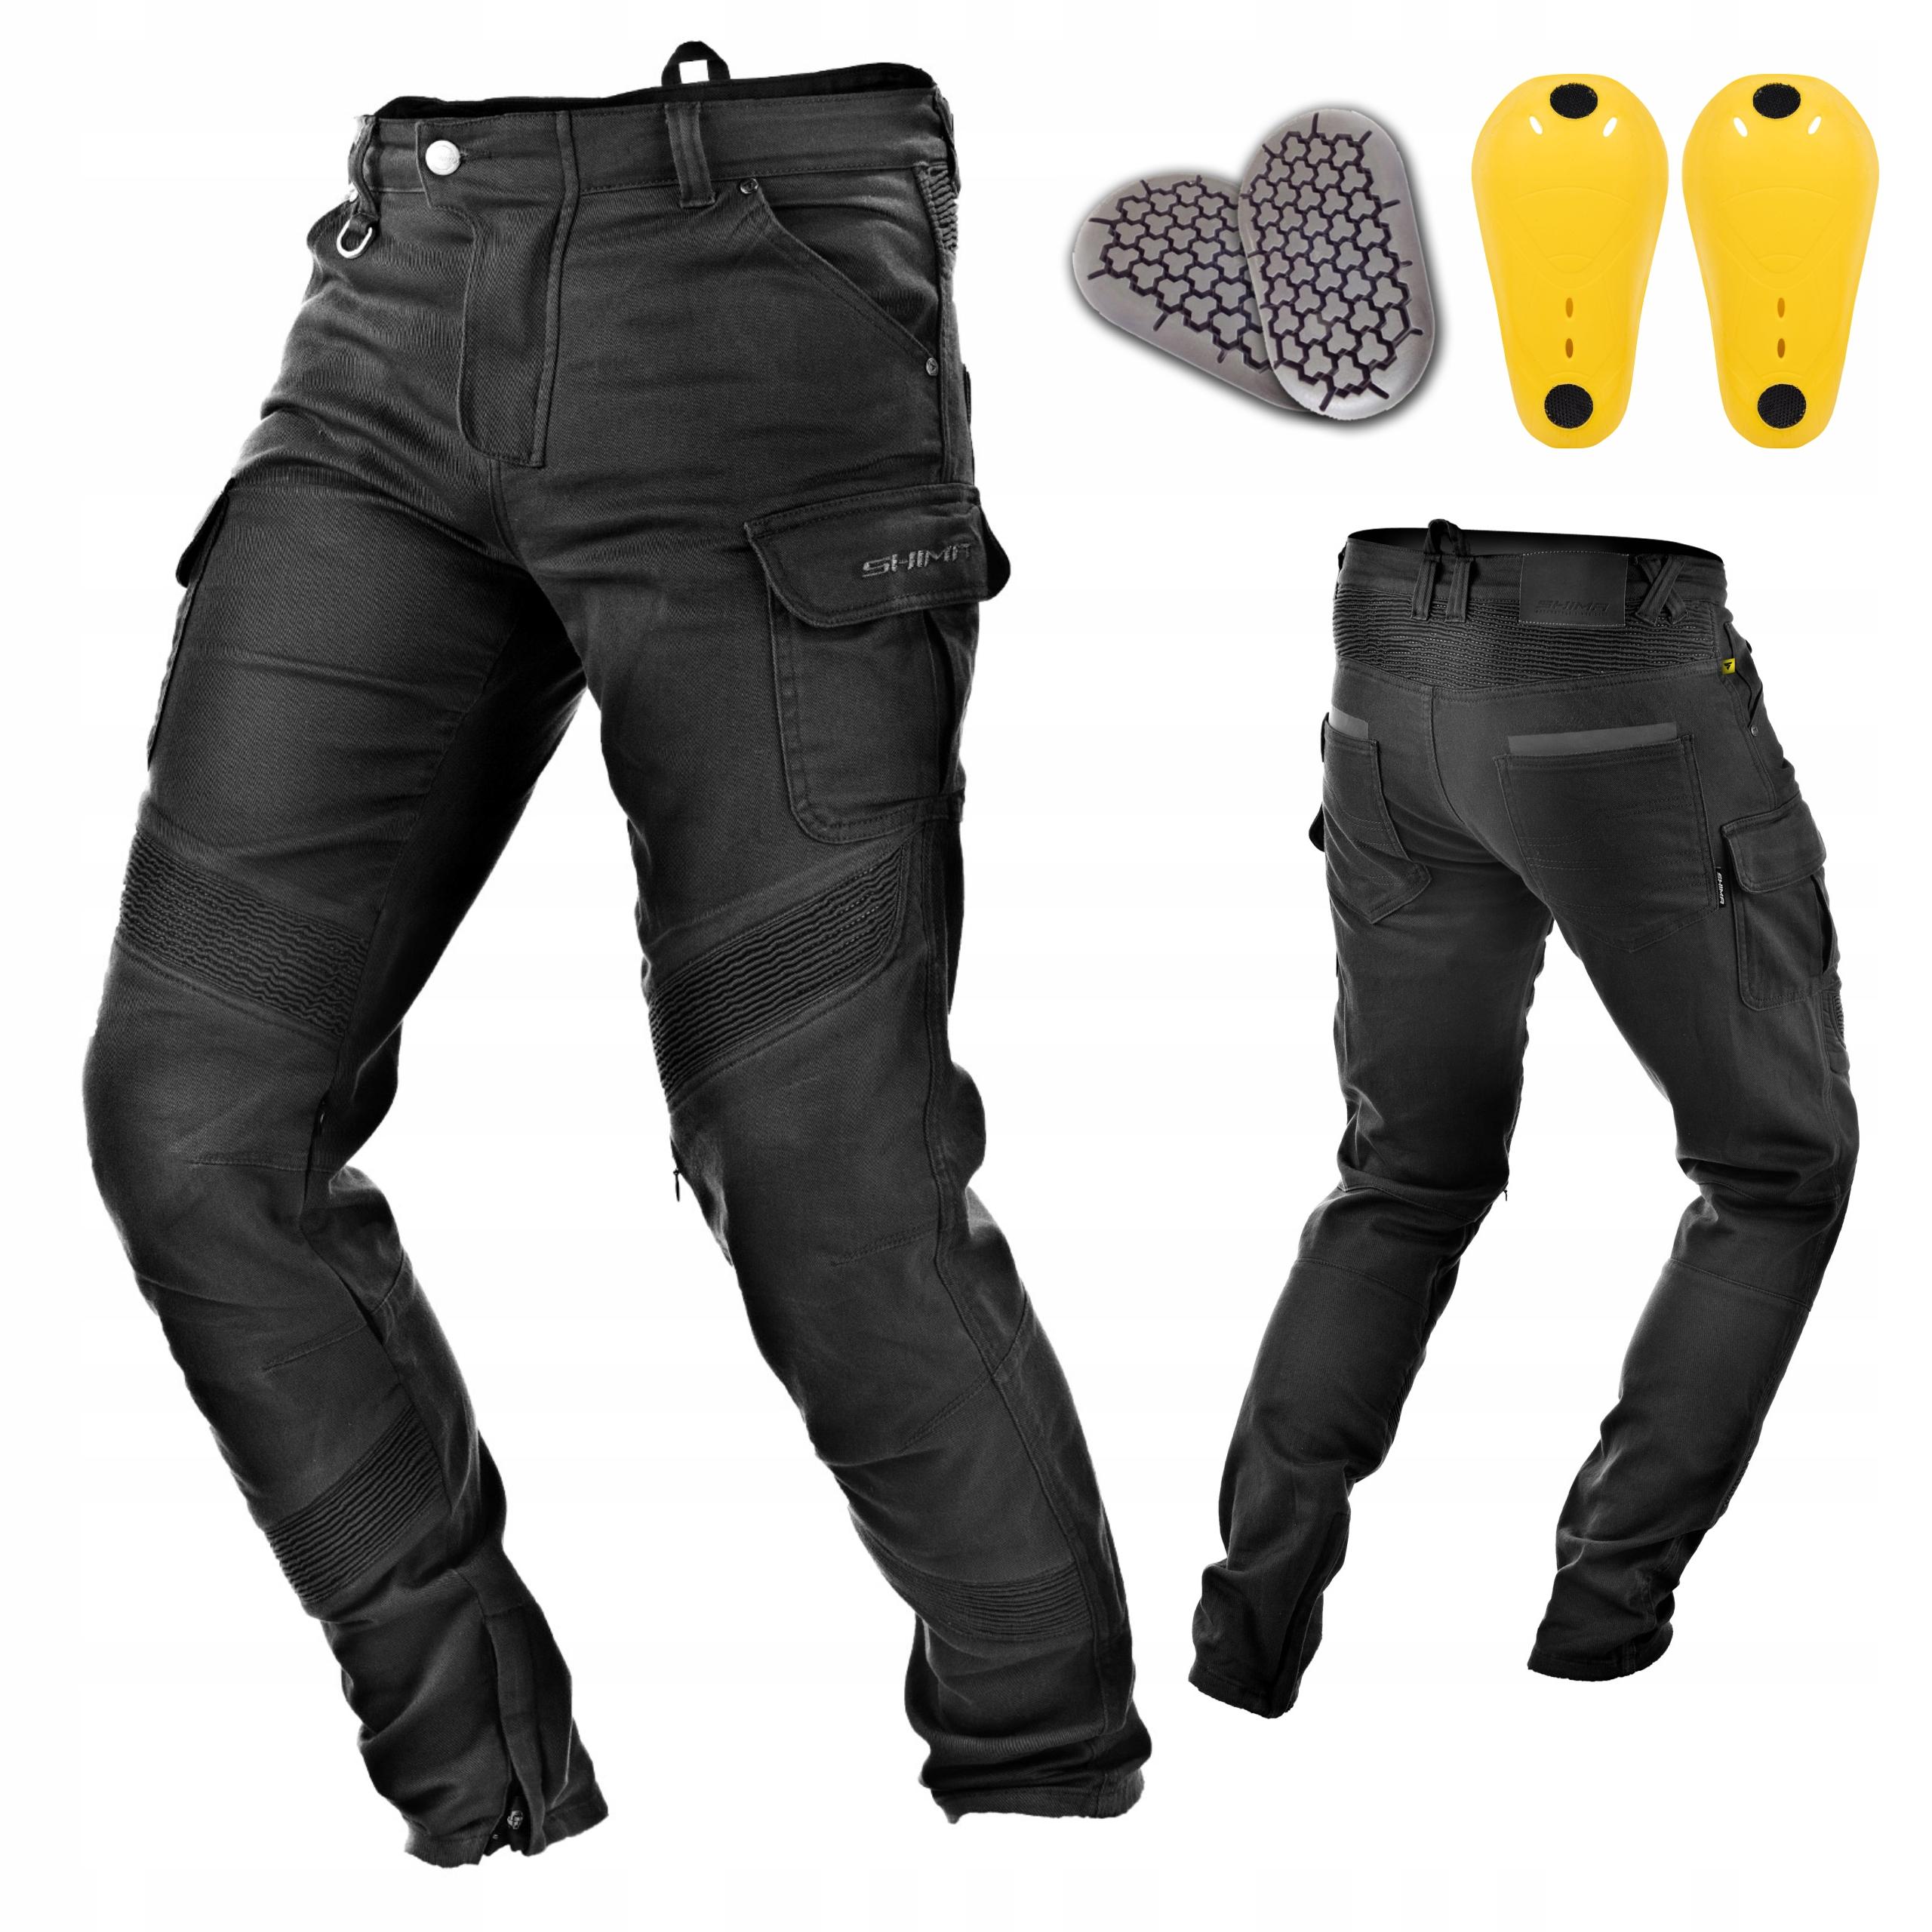 Мотоциклетные штаны SHIMA GIRO + БЕСПЛАТНО